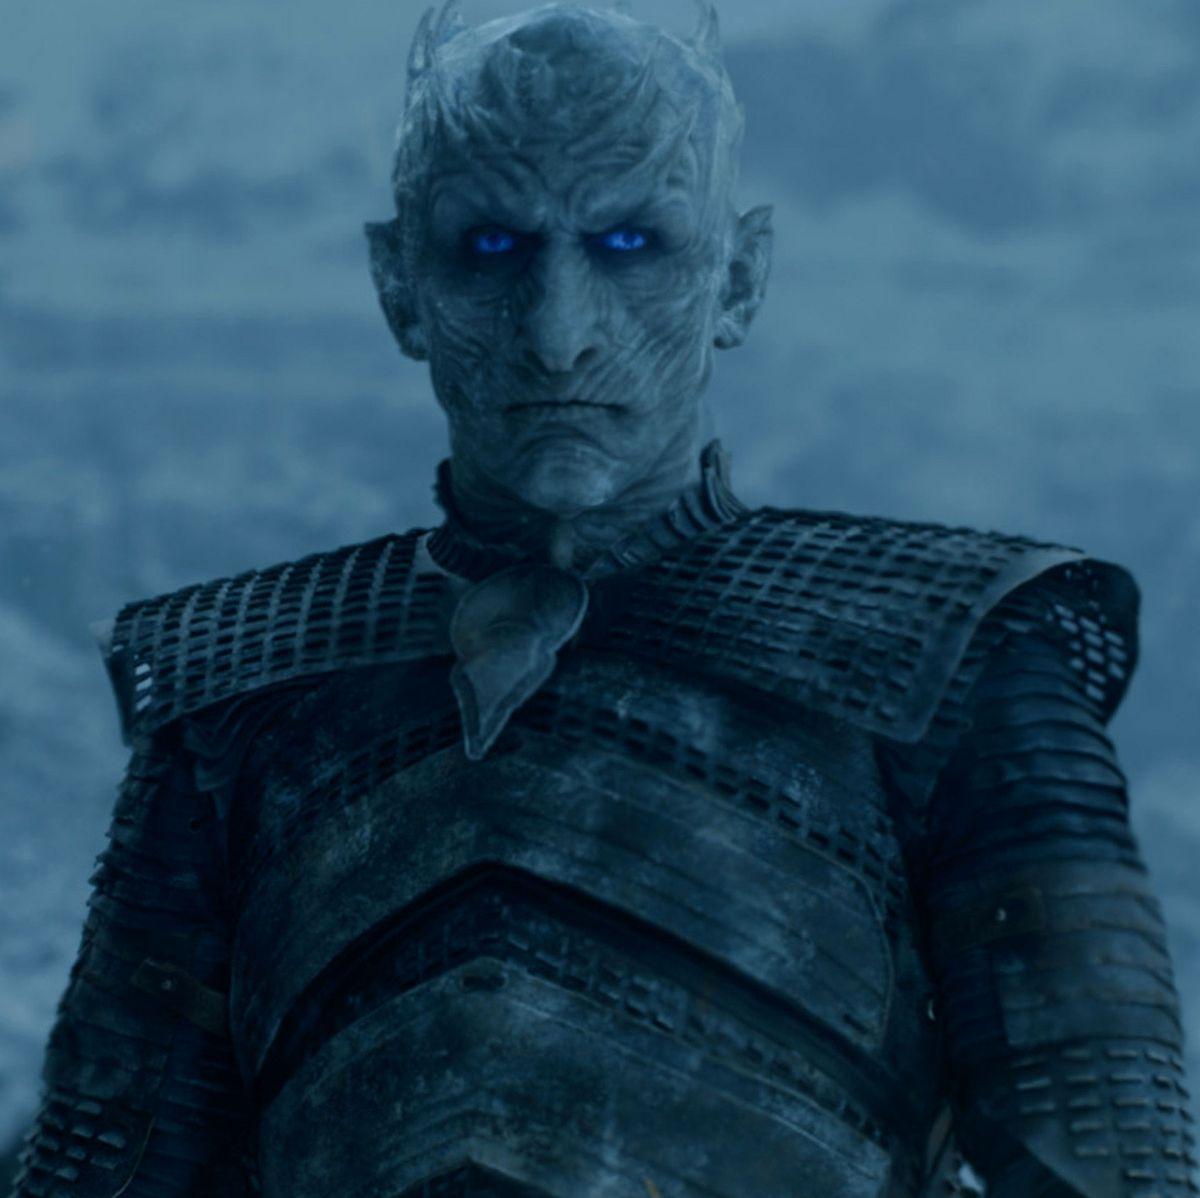 Game Of Thrones Vladimir Furdik On Playing The Night King